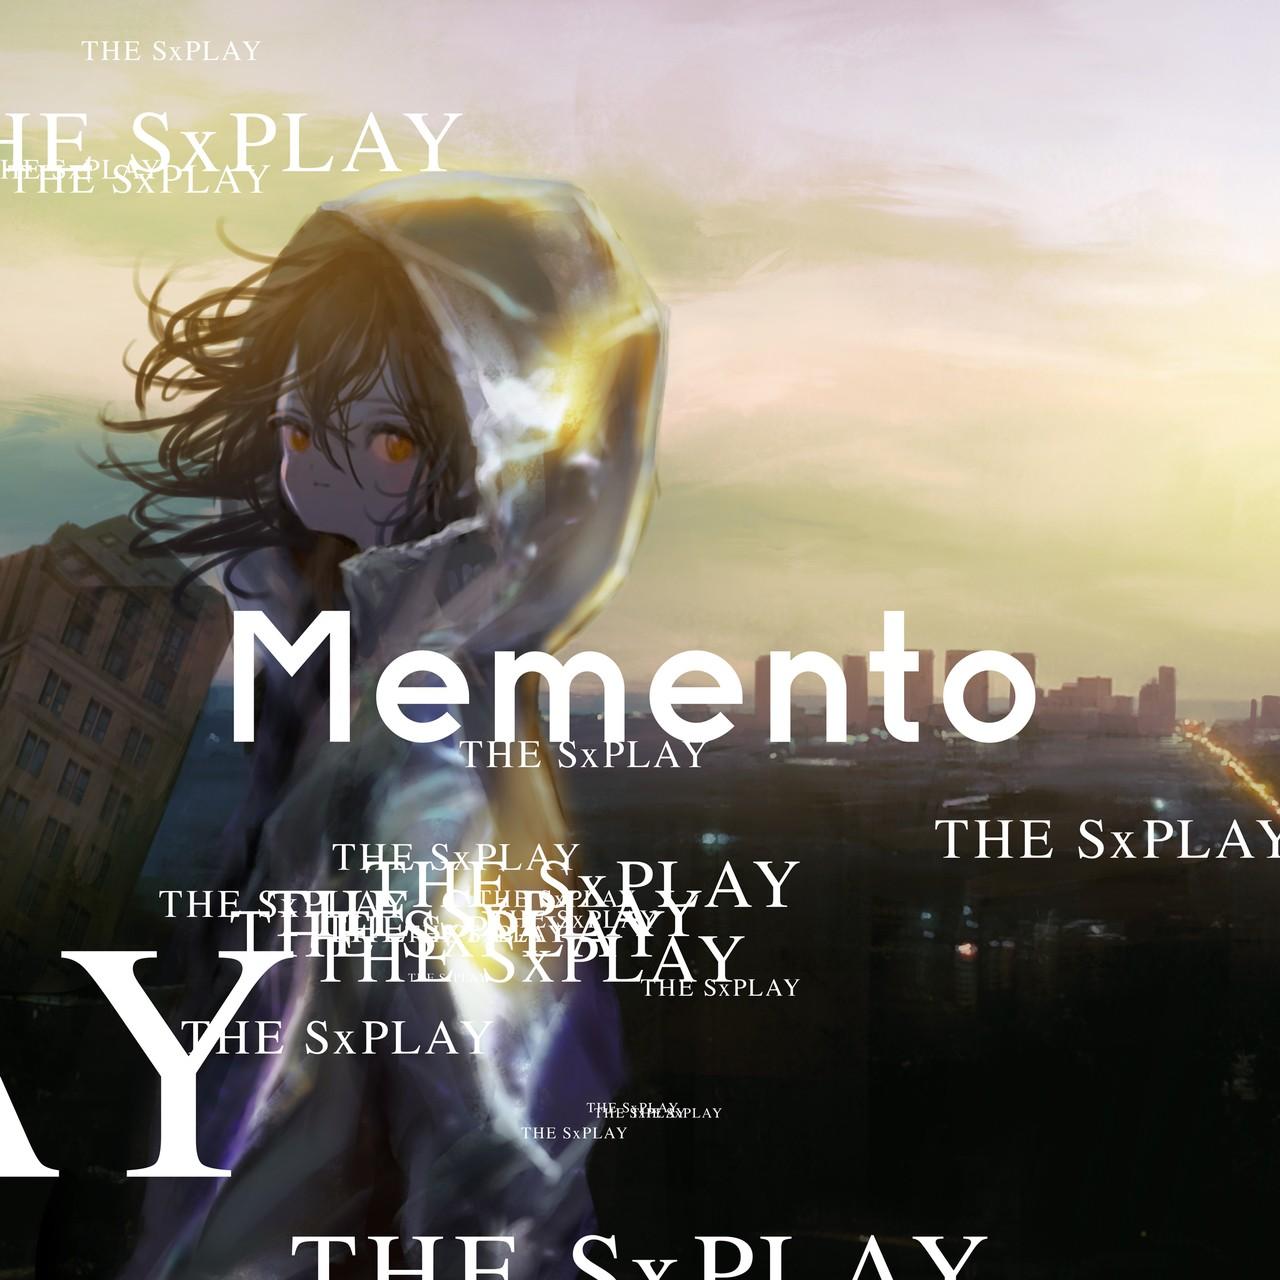 THE SxPLAY(菅原紗由理 / Sayuri Sugawara) – Memento [24bit Lossless + MP3 320 / WEB] [2018.12.15]